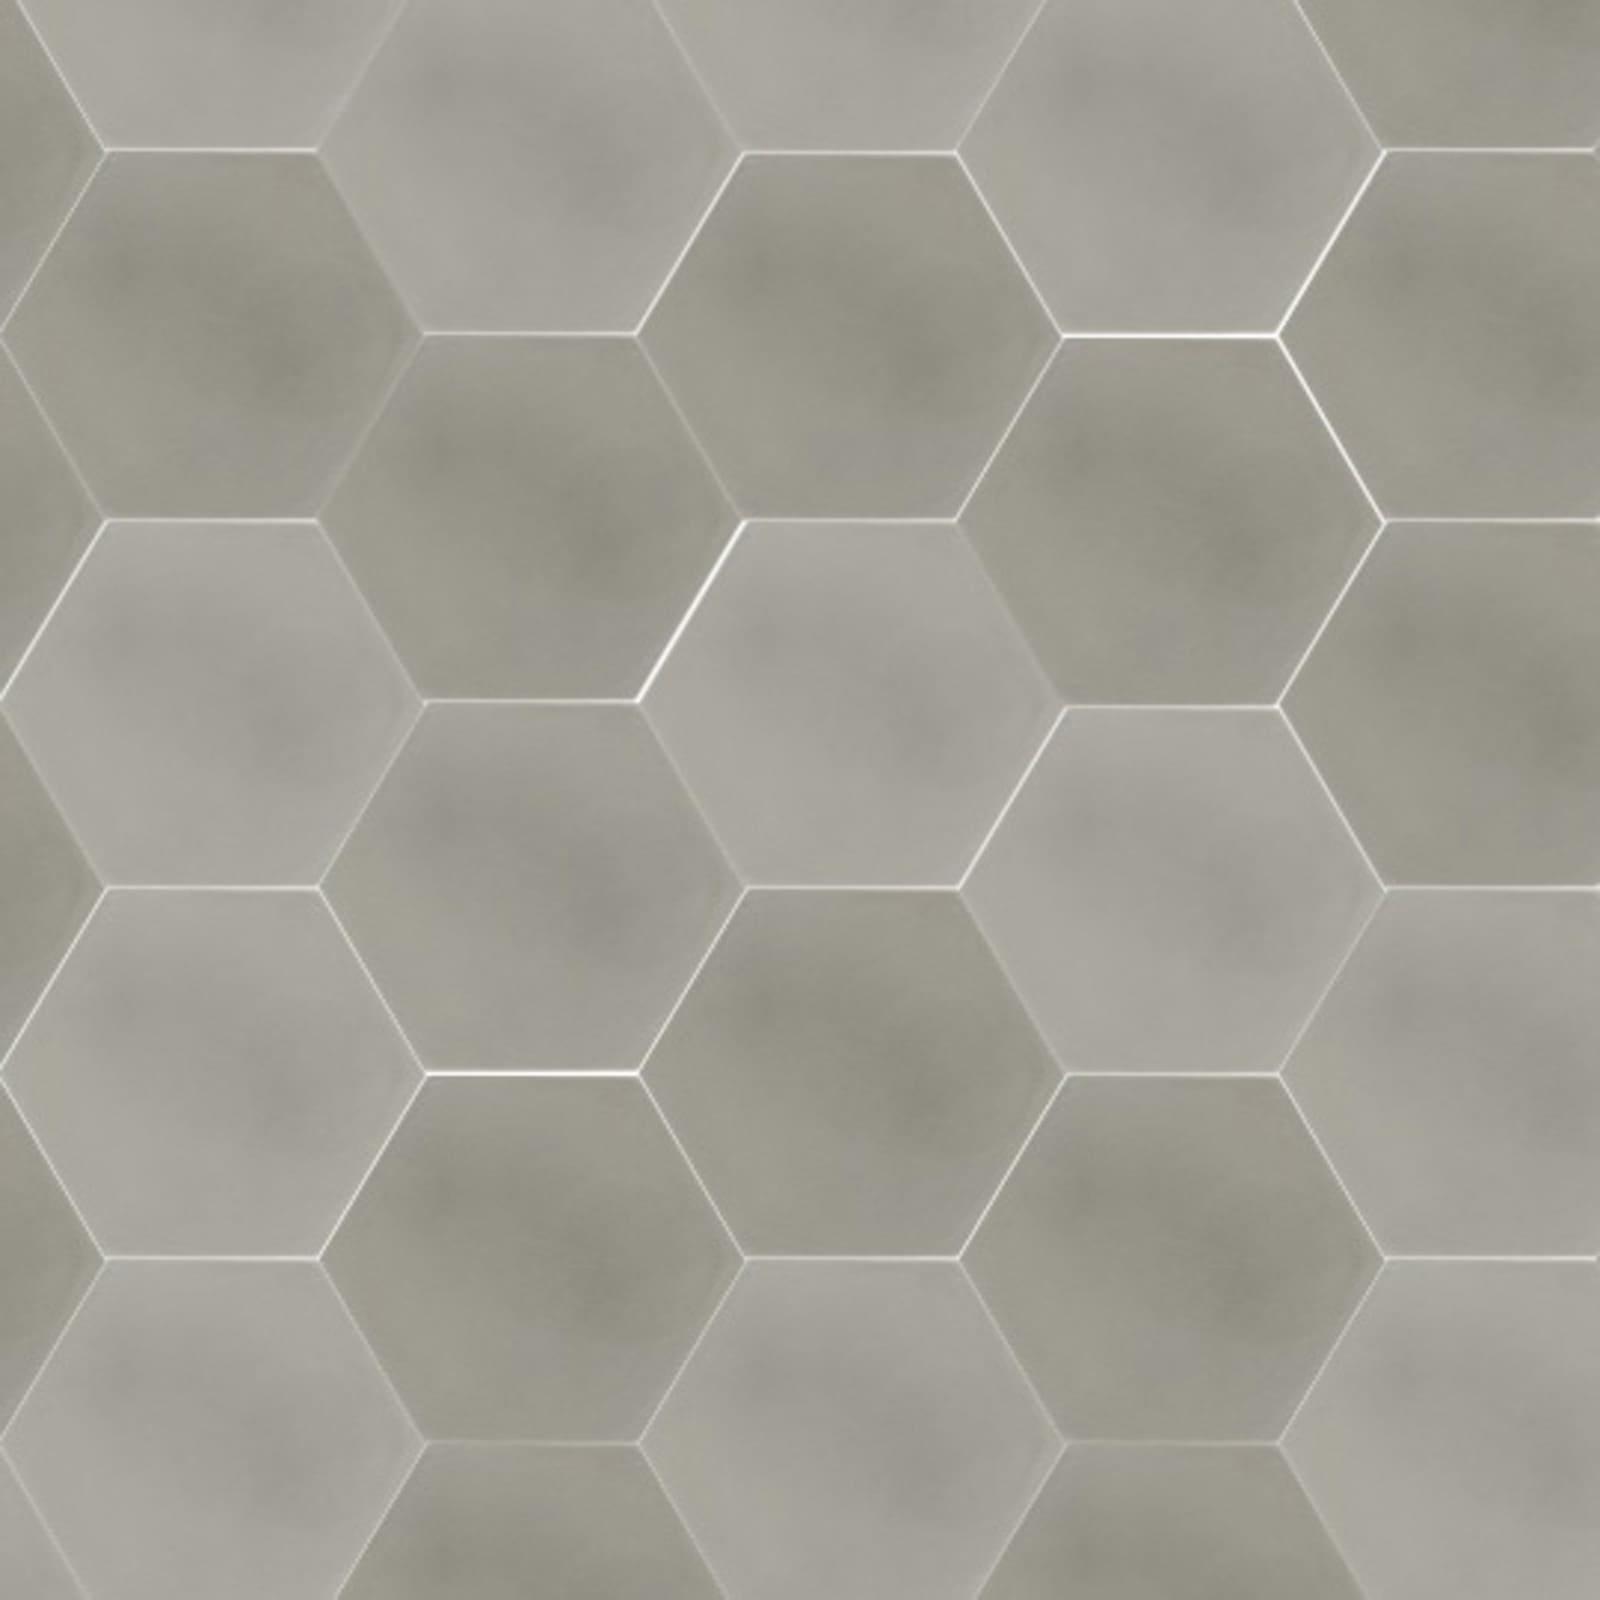 zementfliesen-terrazzofliesen-kreidefarbe-terrazzo-fugenlos-viaplatten-6-52 | 6-52